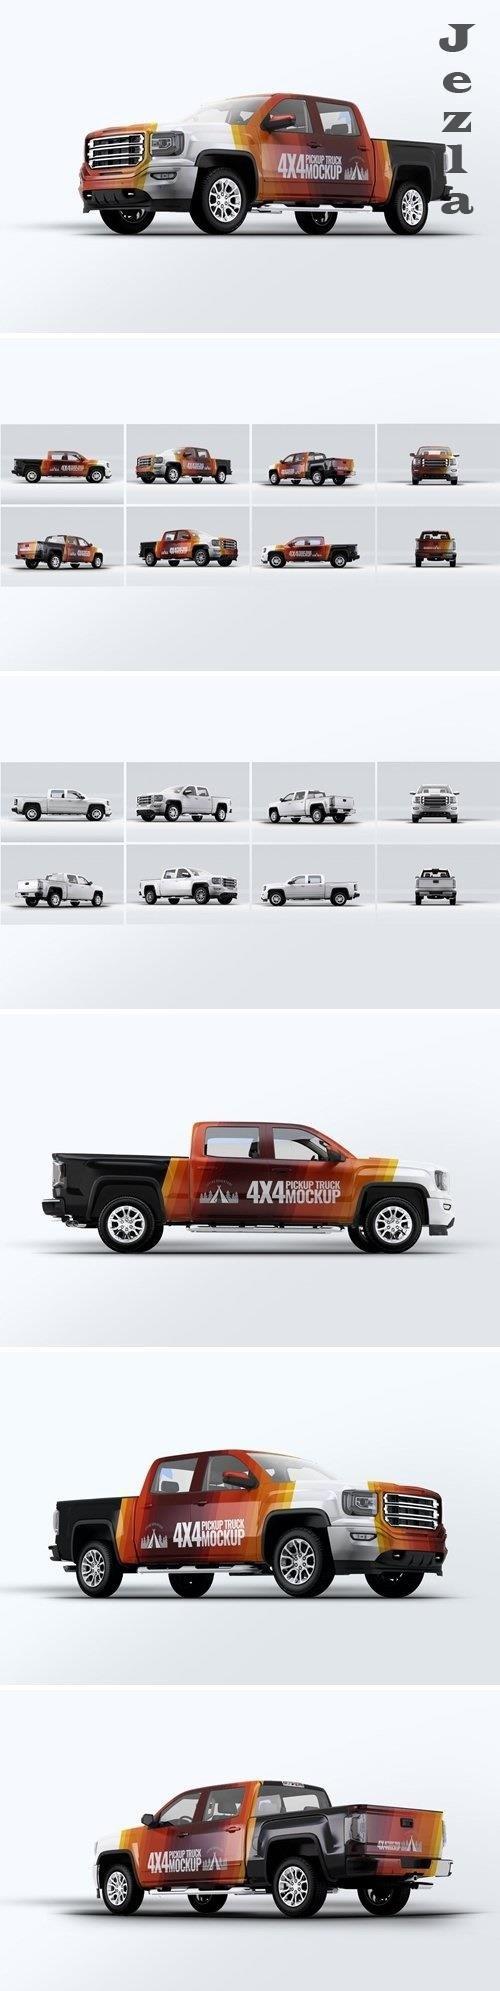 Truck 4X4 Mock-Up - HJ43RB3